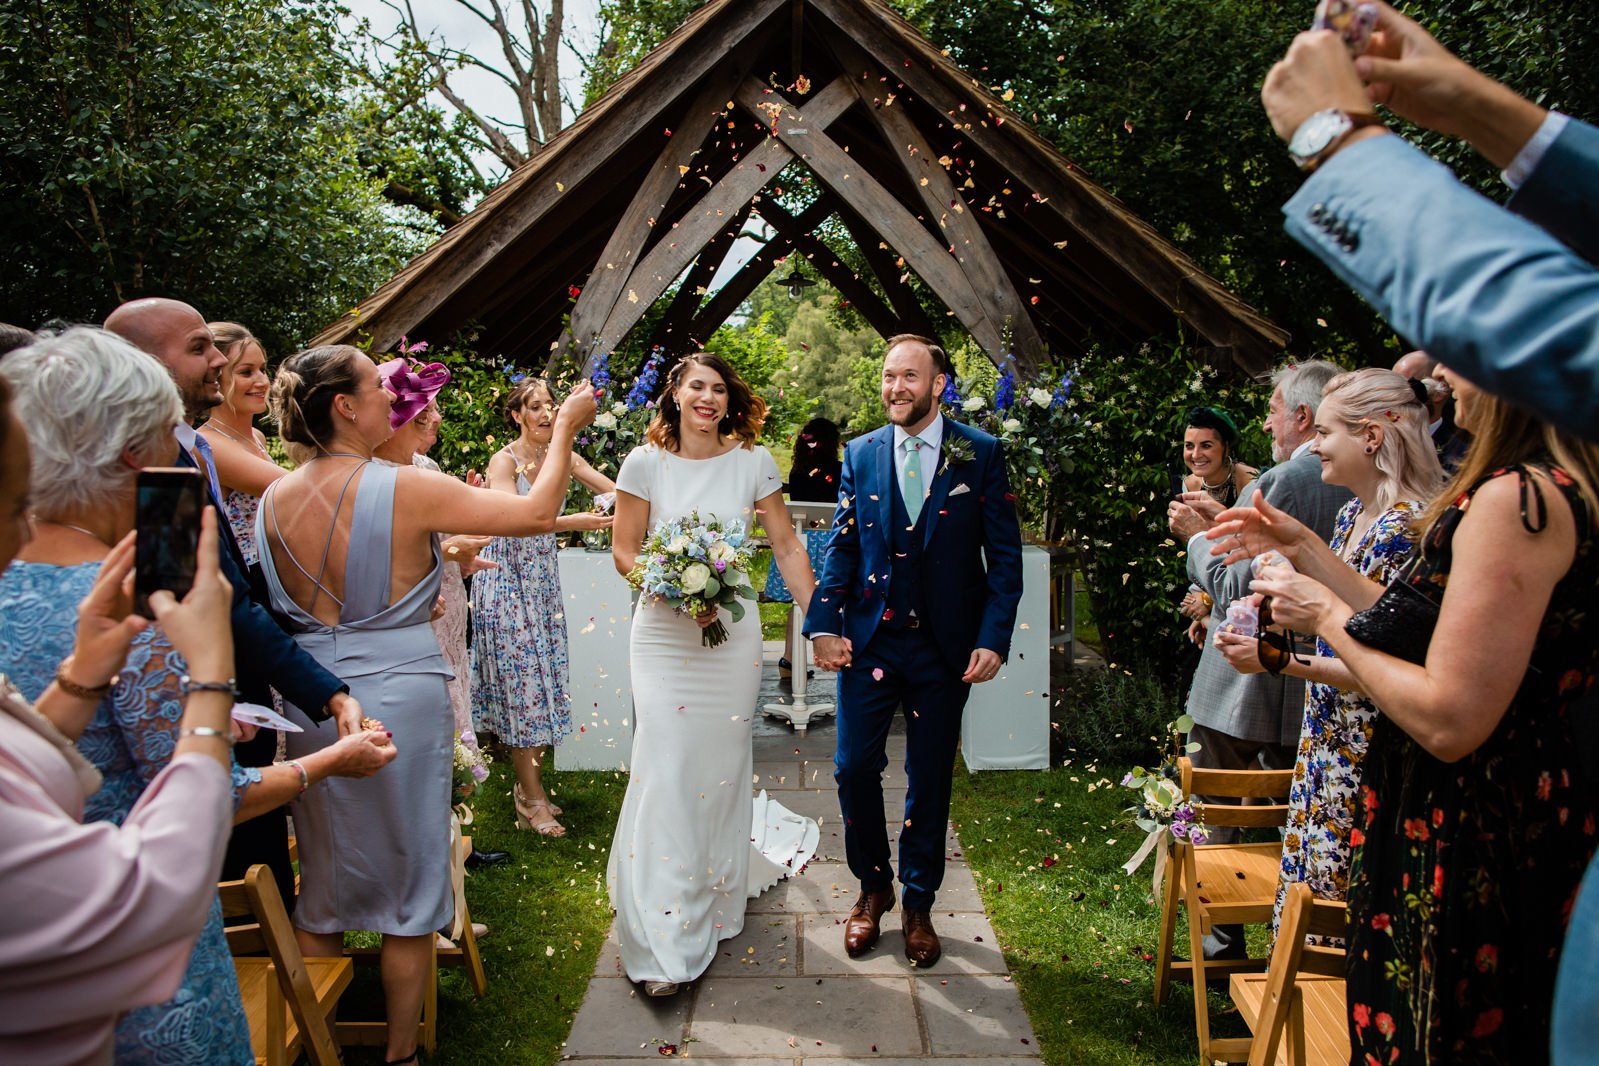 Millbridge Court Wedding - stunning summer wedding - wedding photography 61